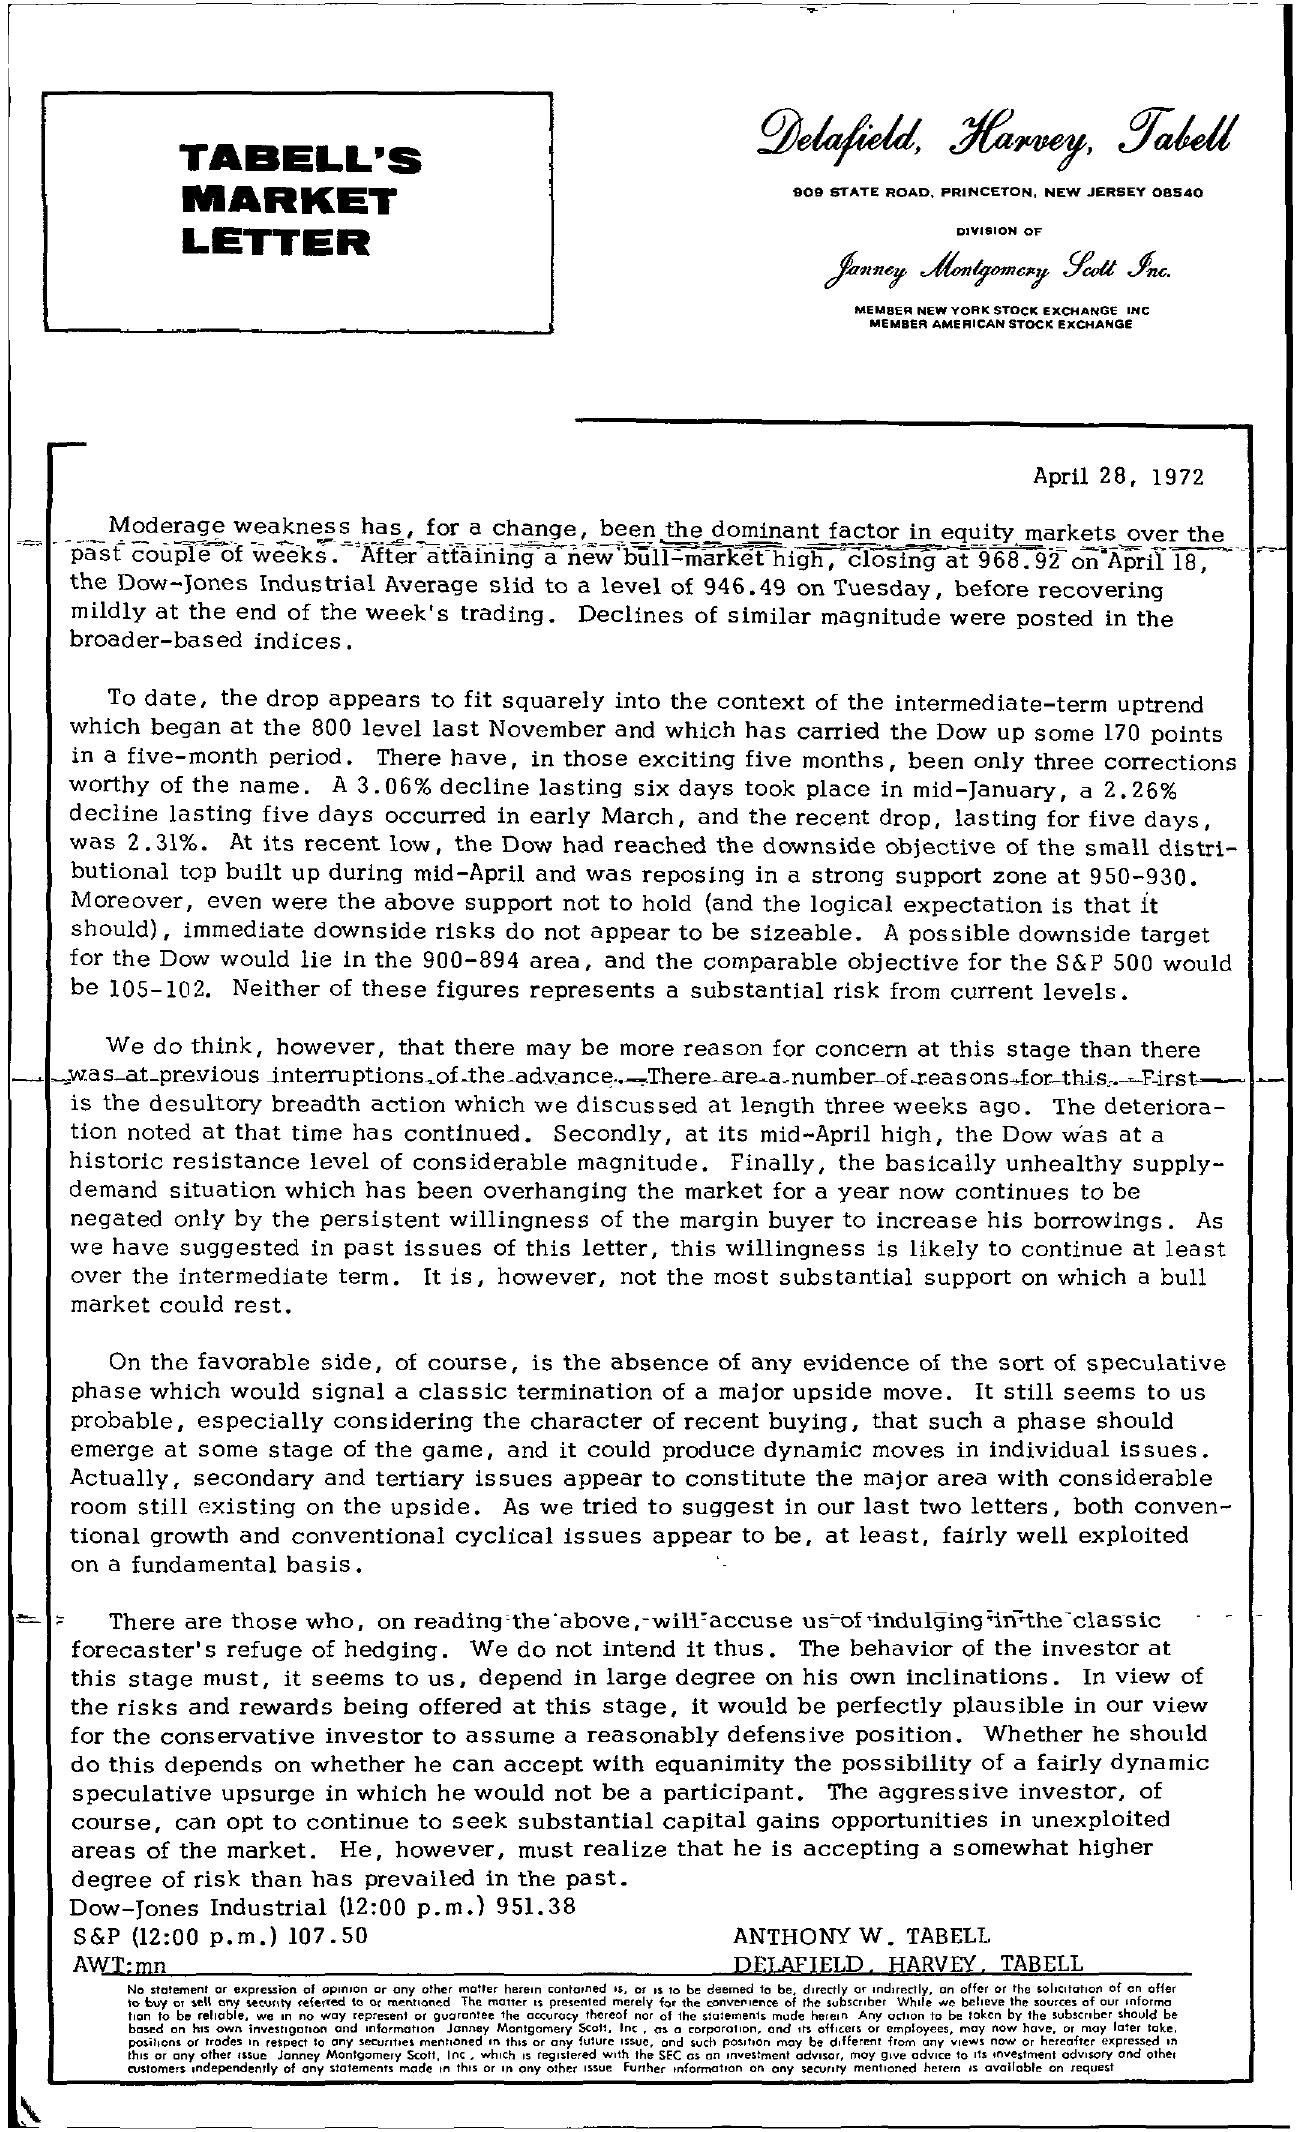 Tabell's Market Letter - April 28, 1972